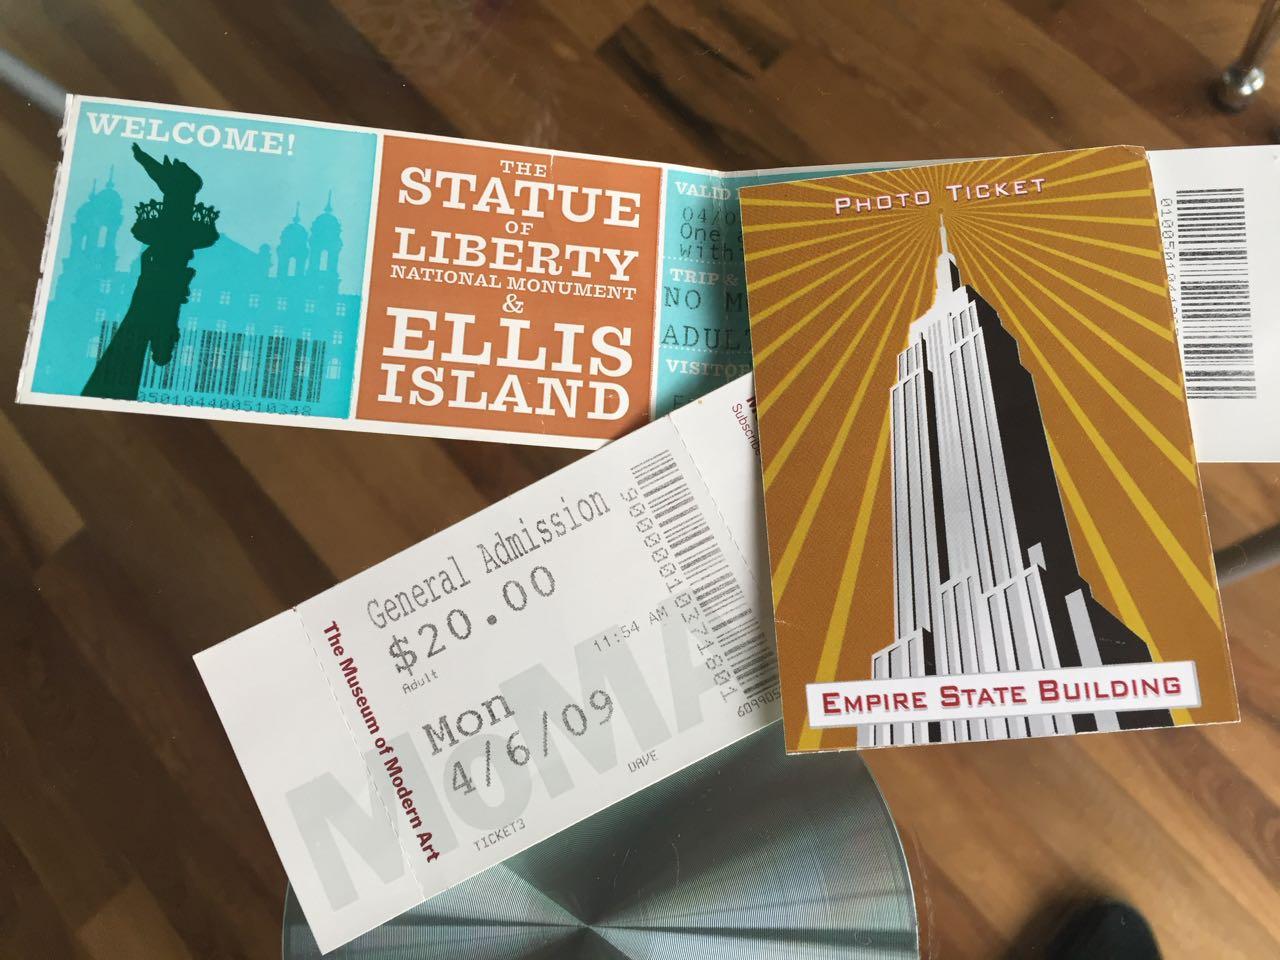 whatsapp image 2017 06 07 at 16 17 53 - La New York Pass vs New York City Pass ¿Cuál conviene?